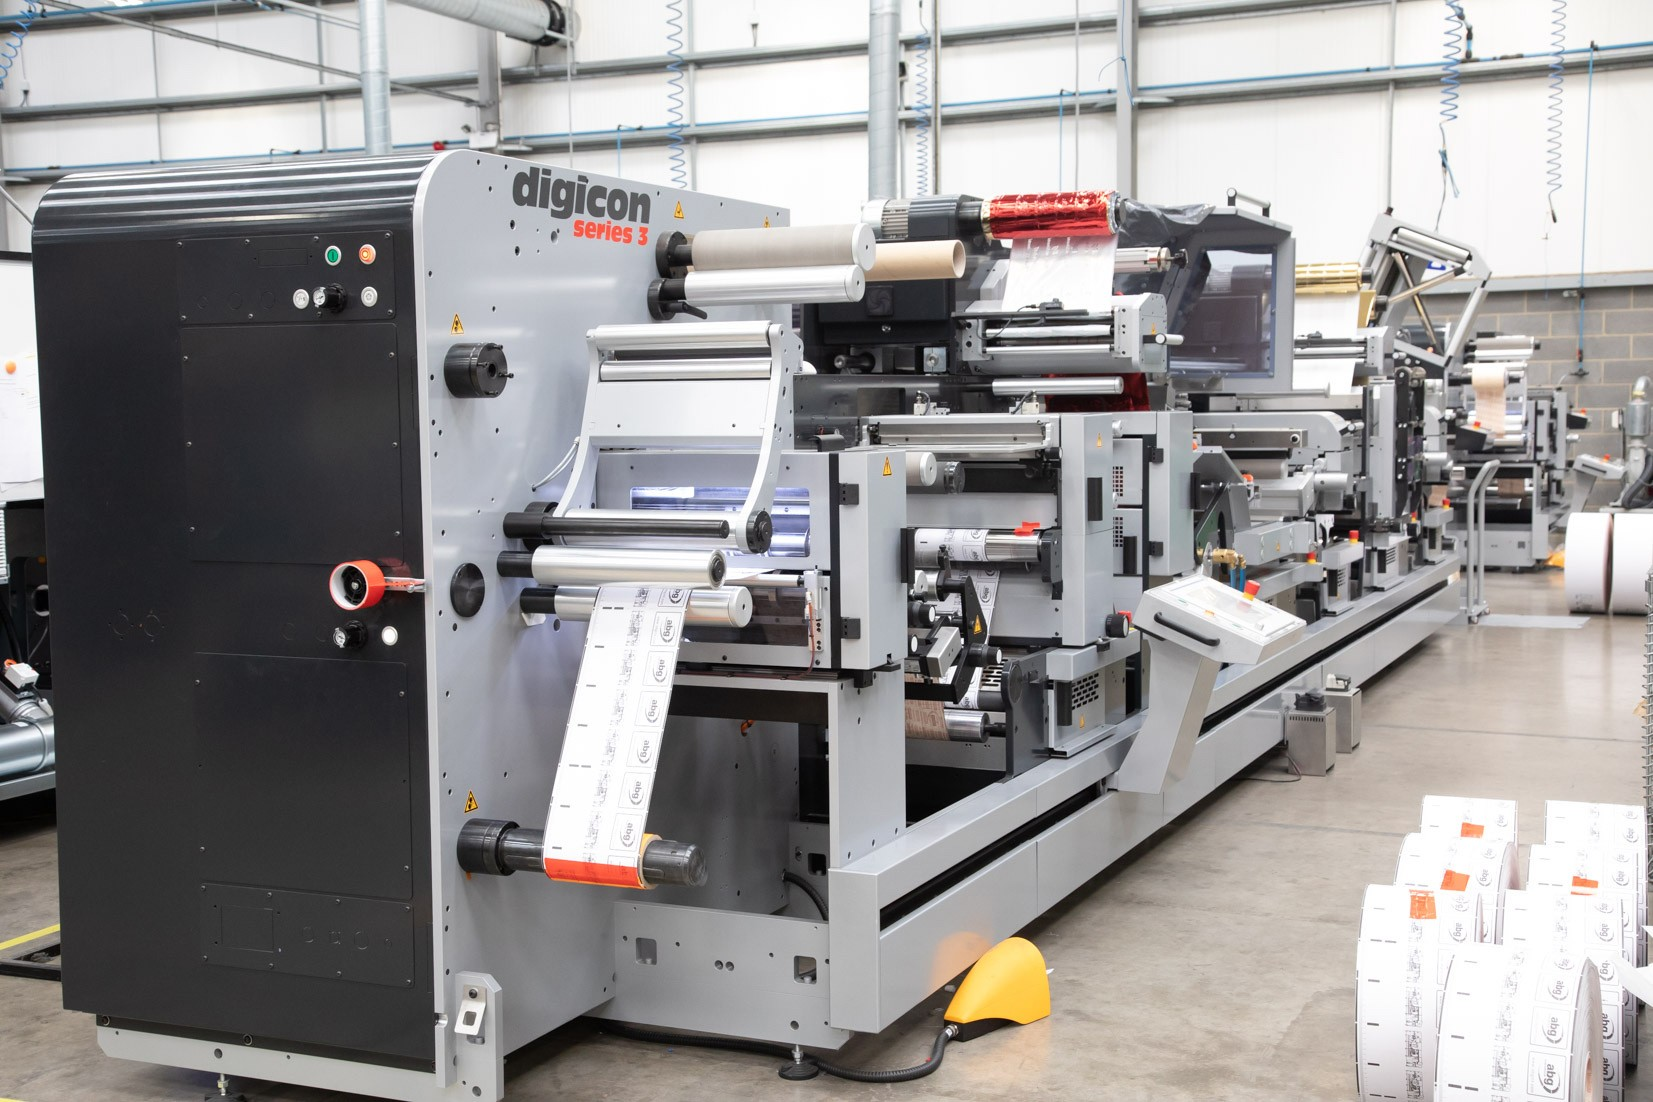 A B Graphic International Ltd » Digicon 3 L2 » PP Control & Automation